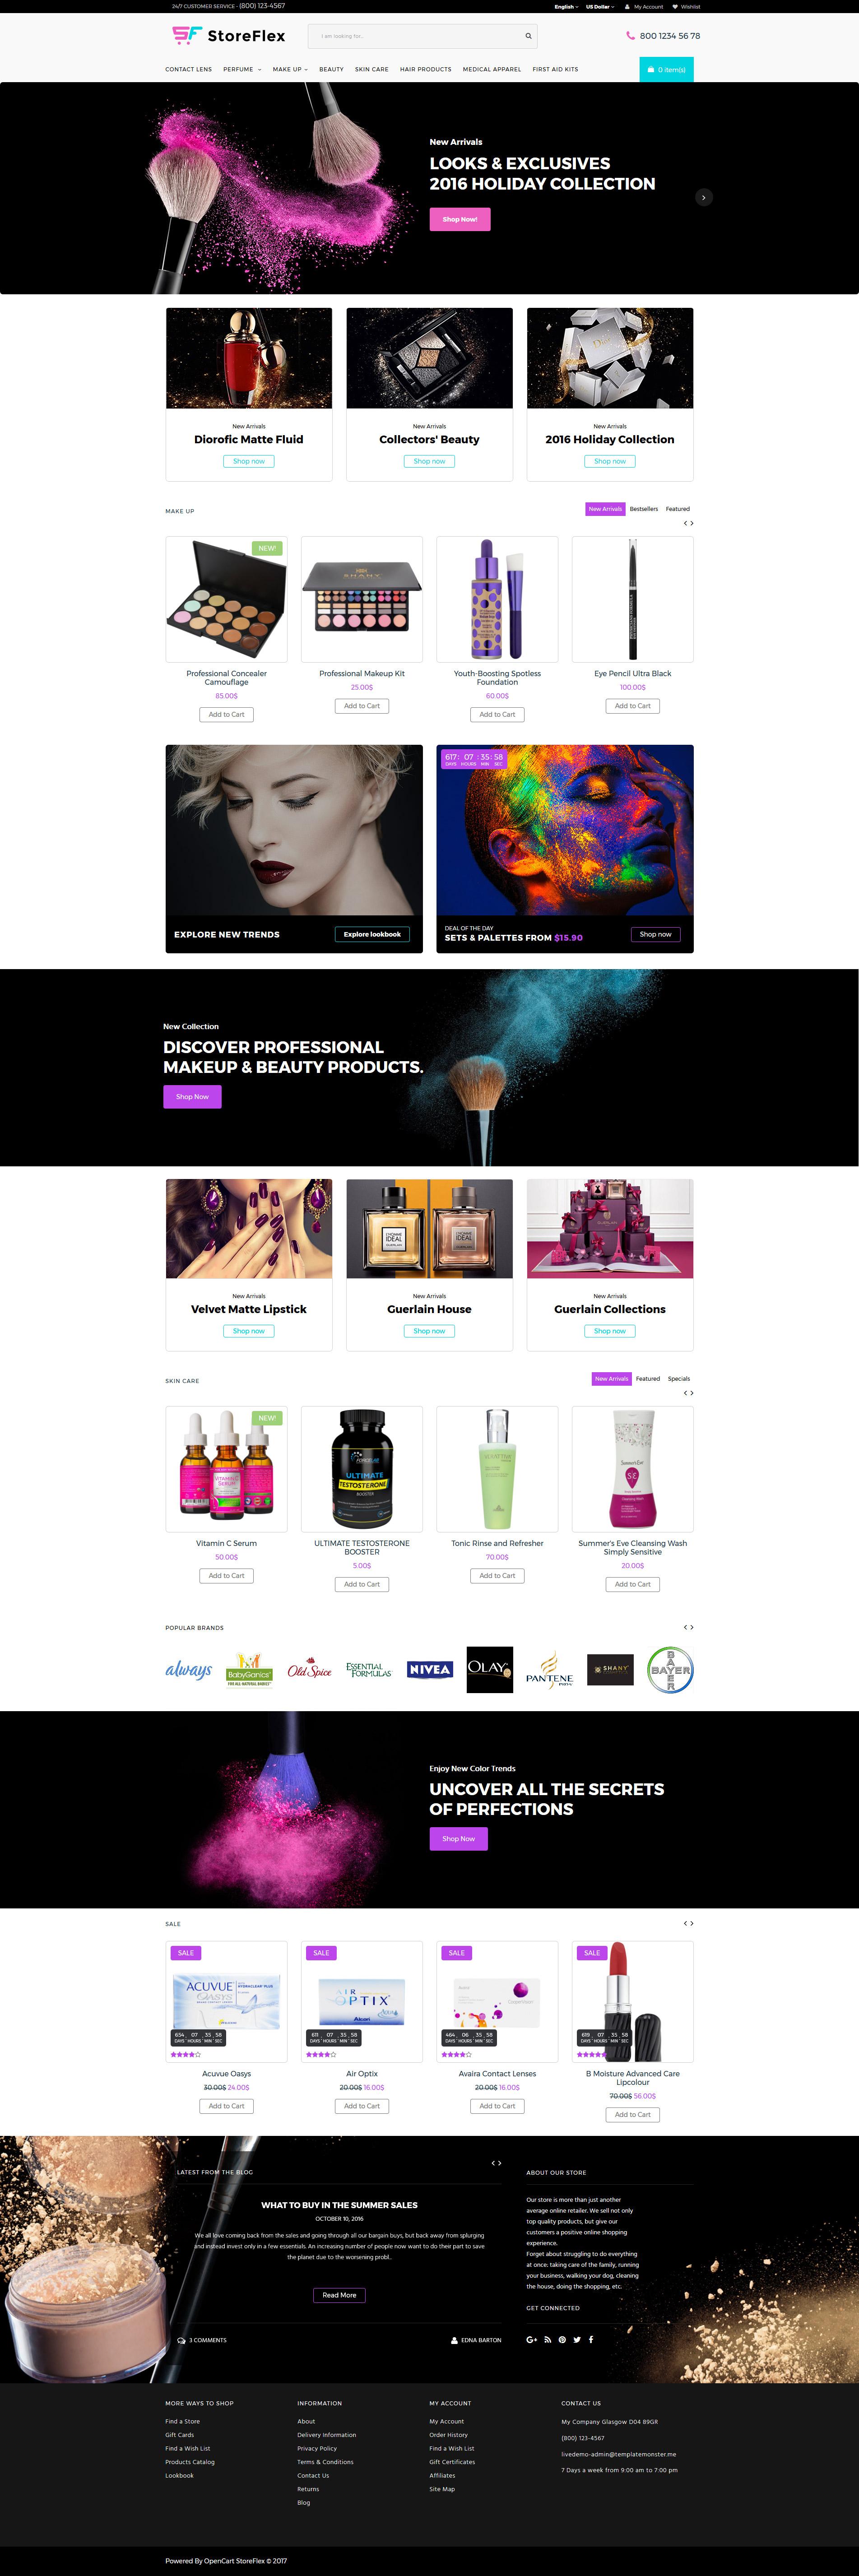 StoreFlex - Cosmetics Store Responsive №63354